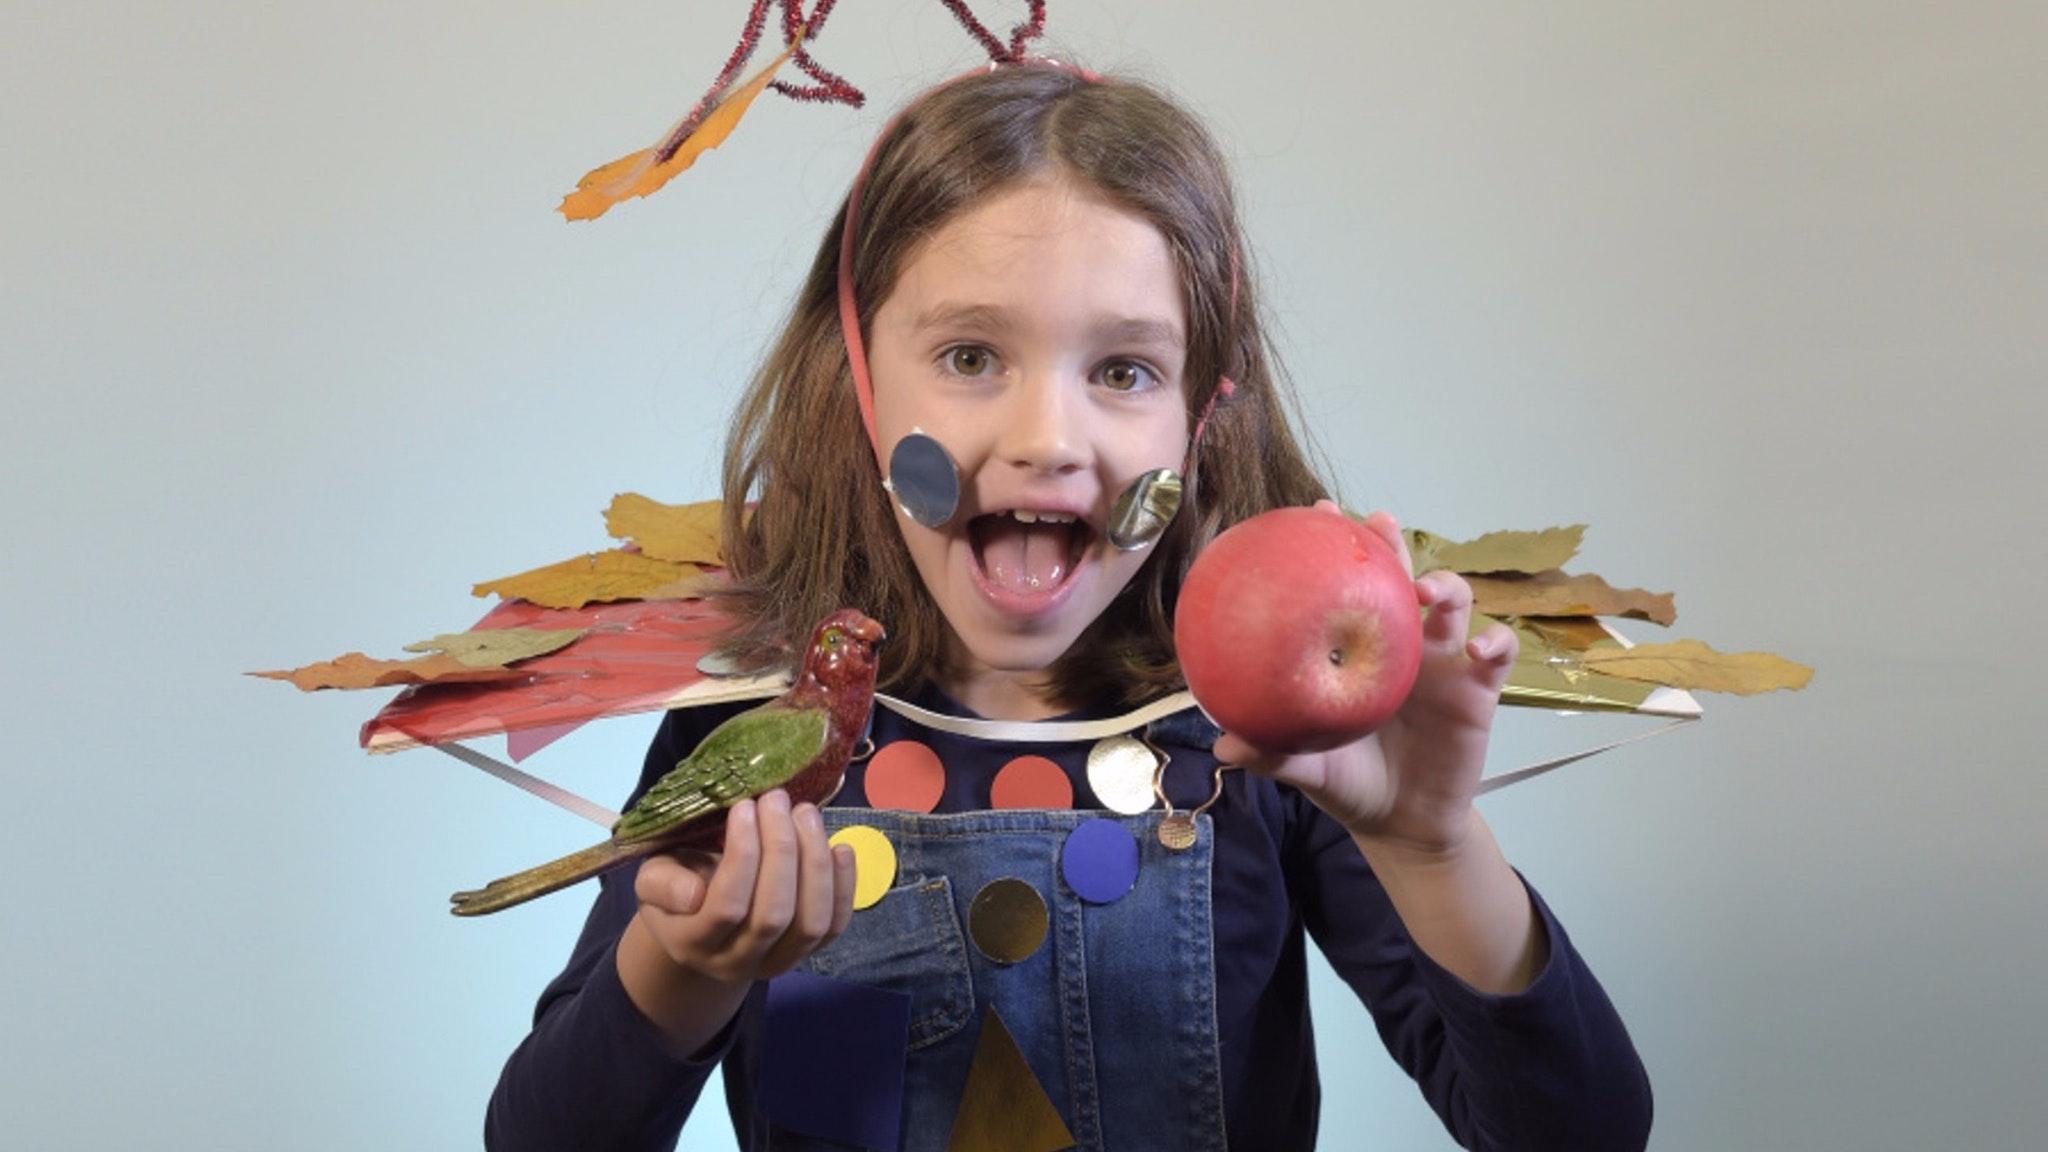 A little girl holding a porcelain bird and an apple on each hand